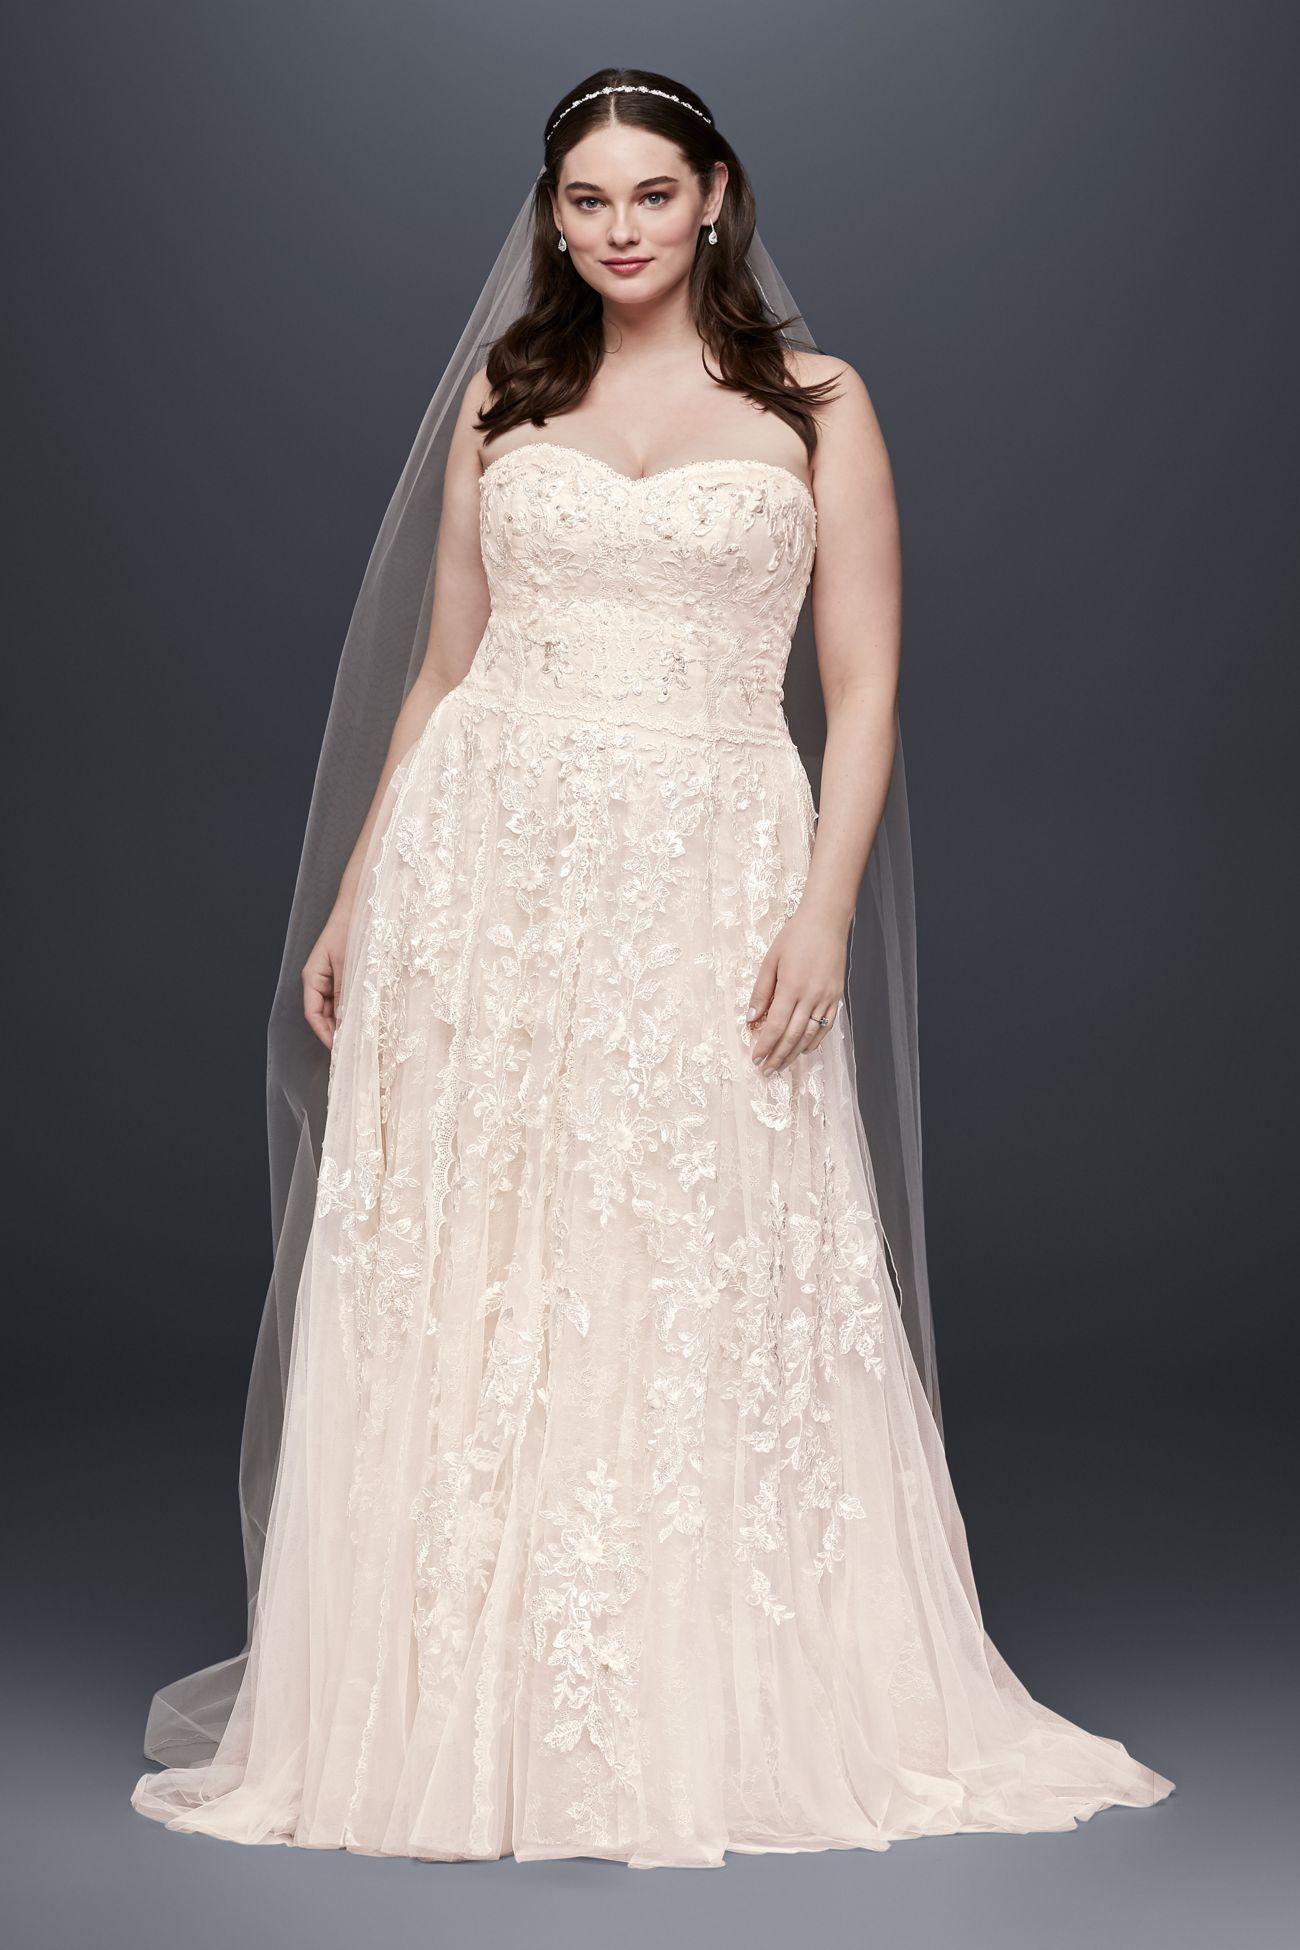 Boho wedding dress plus size  MS  goin to the chapel one day  Pinterest  Wedding